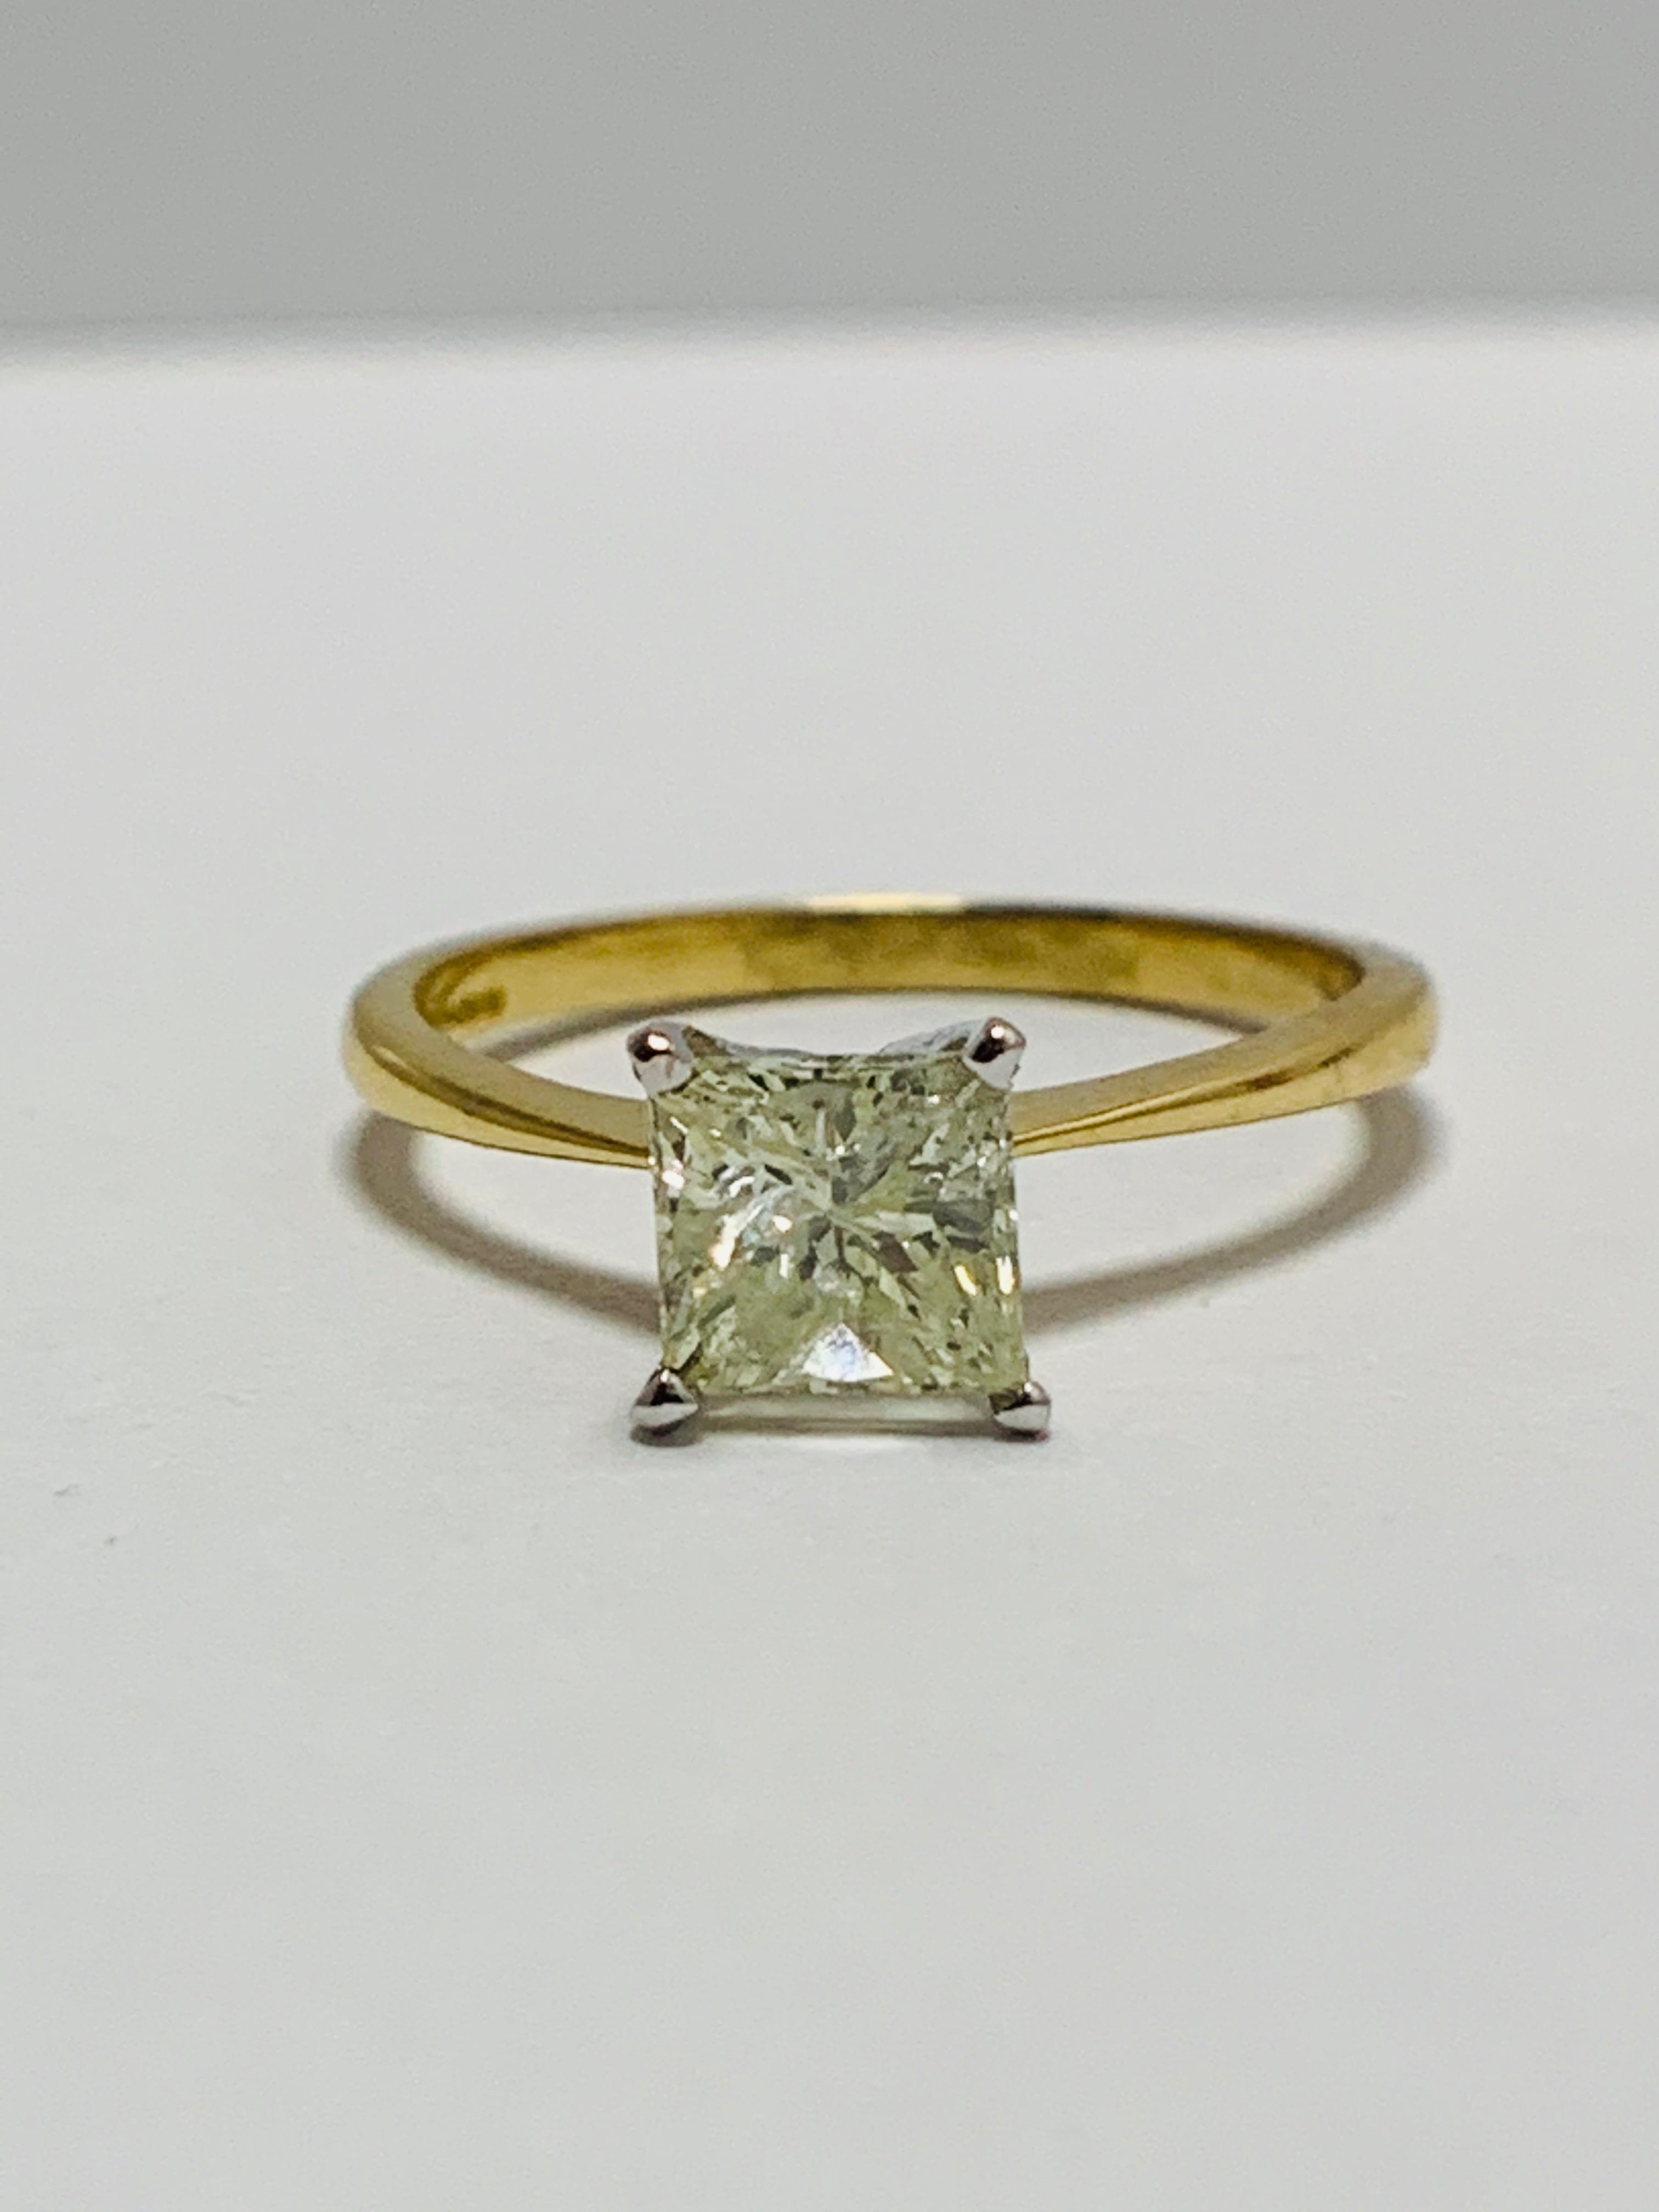 Lot 37 - 18ct Princess Cut natural diamond solitaire ring